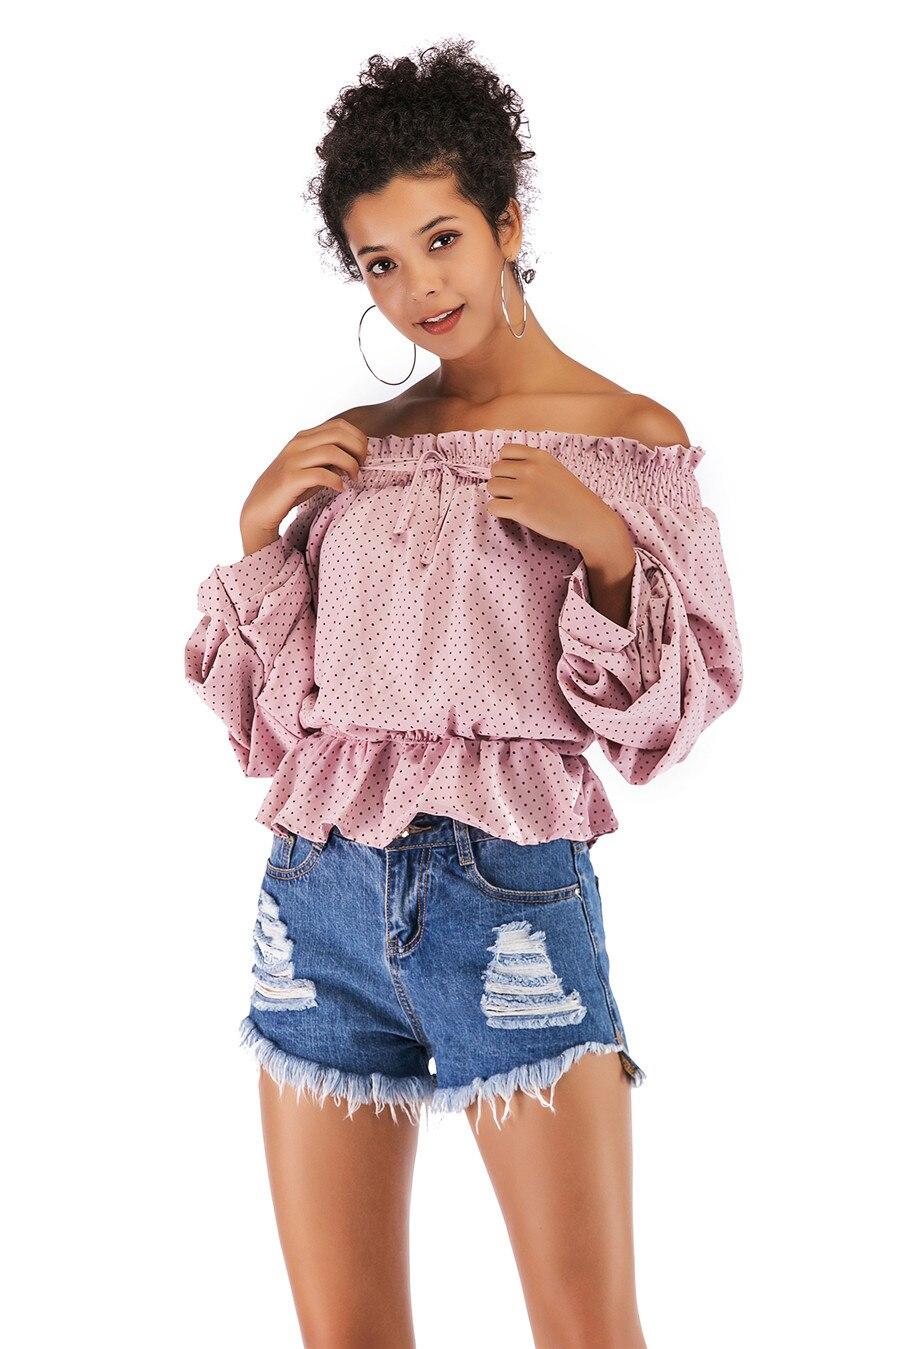 Gladiolus Chiffon Blouse Women 2019 Spring Autumn Long Sleeve Polka Dot Off Shoulder Sexy Blouses Women Shirts Ruffles Blusas (28)